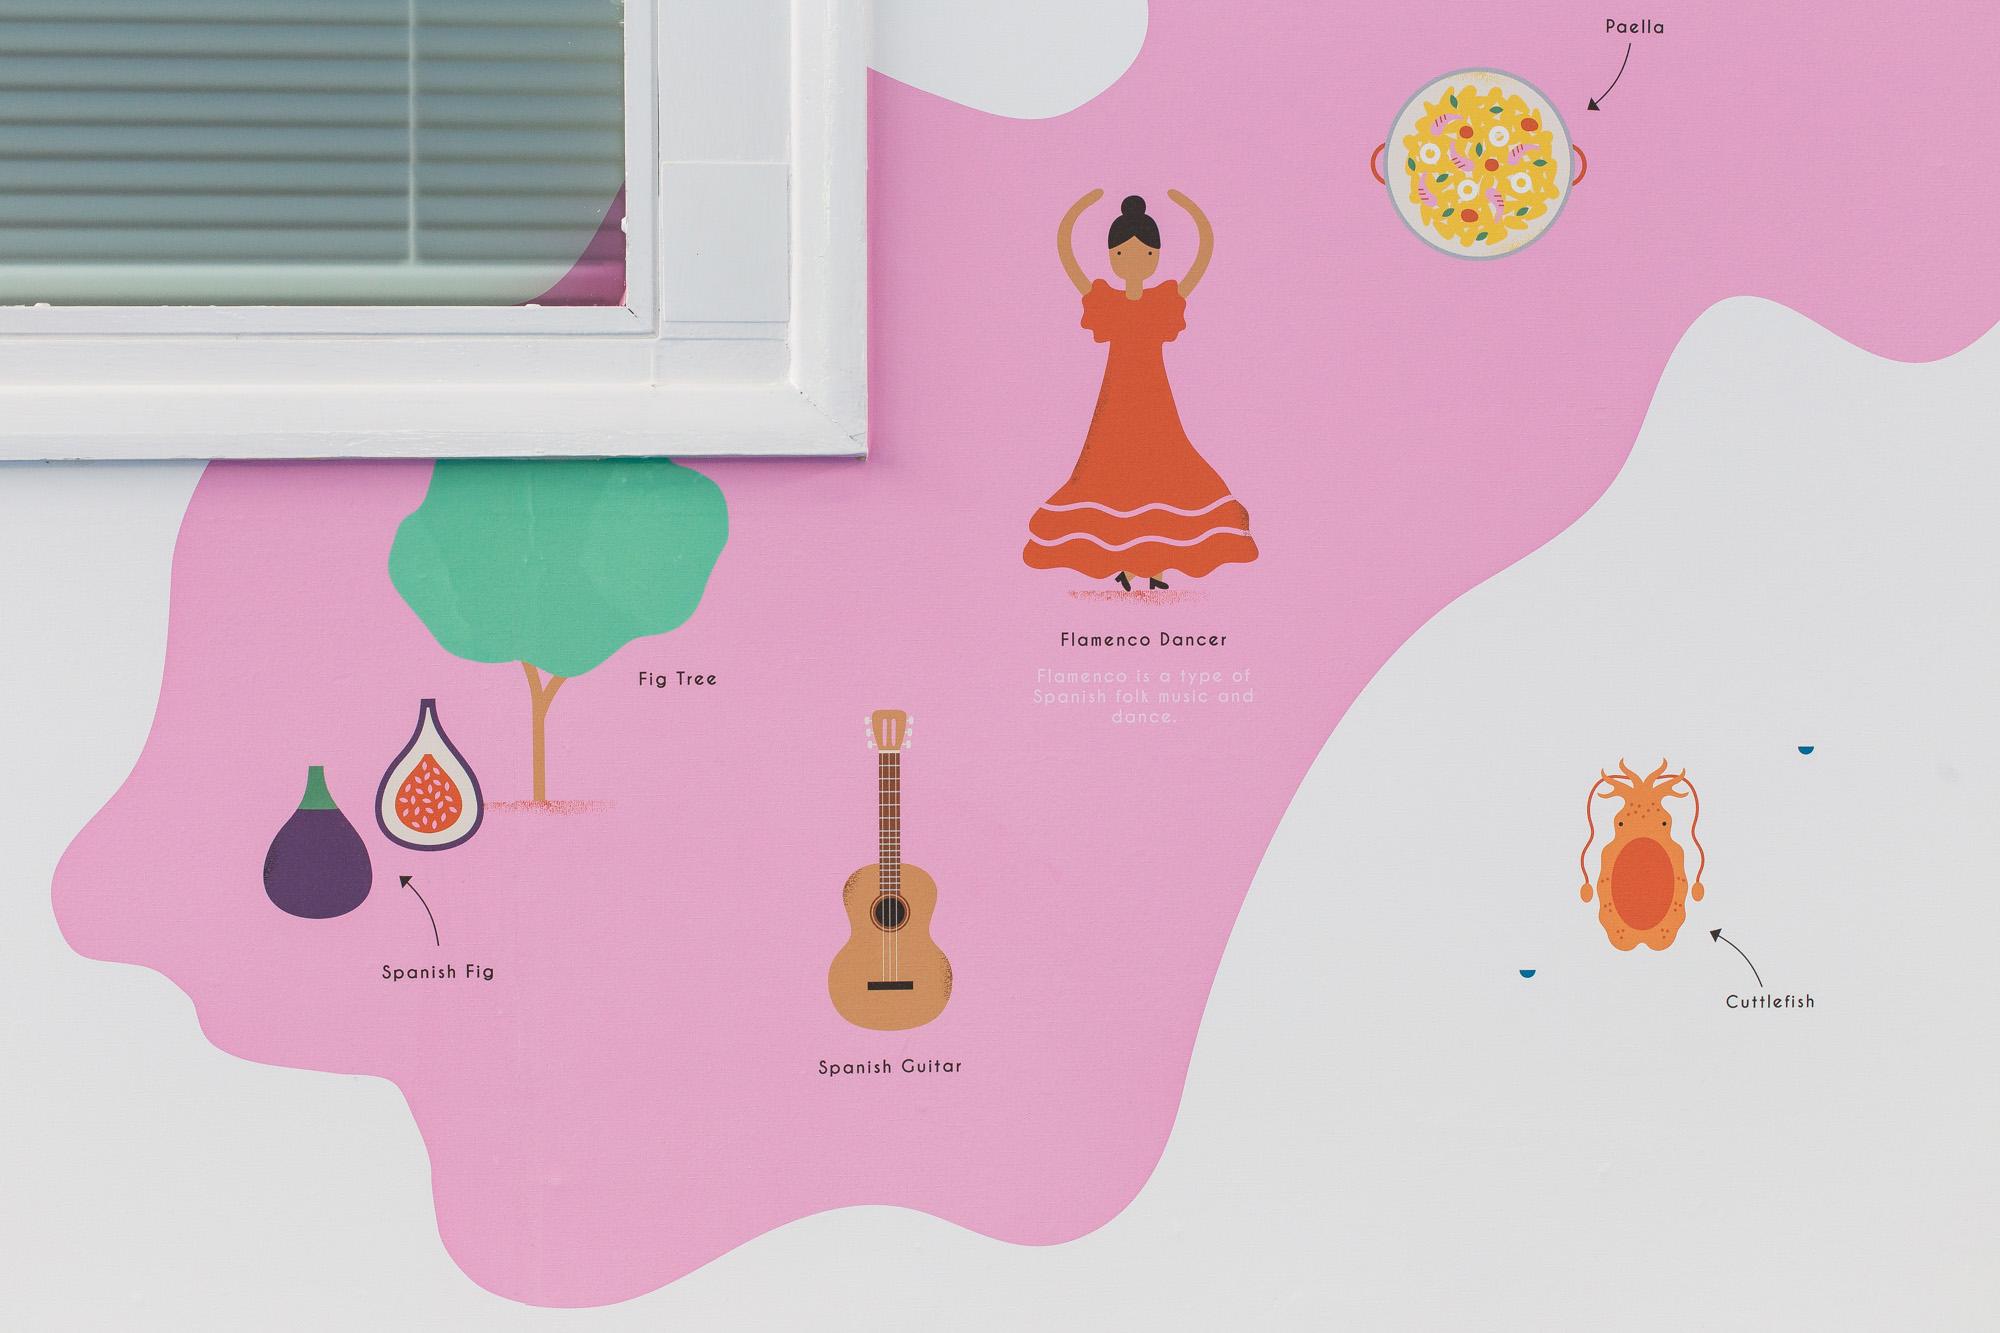 hannahalice-illustration-spacedesign-world-map-grazebrookprimaryschool-mural-spain-flamenco-dancer-fig-wallpaper.jpg